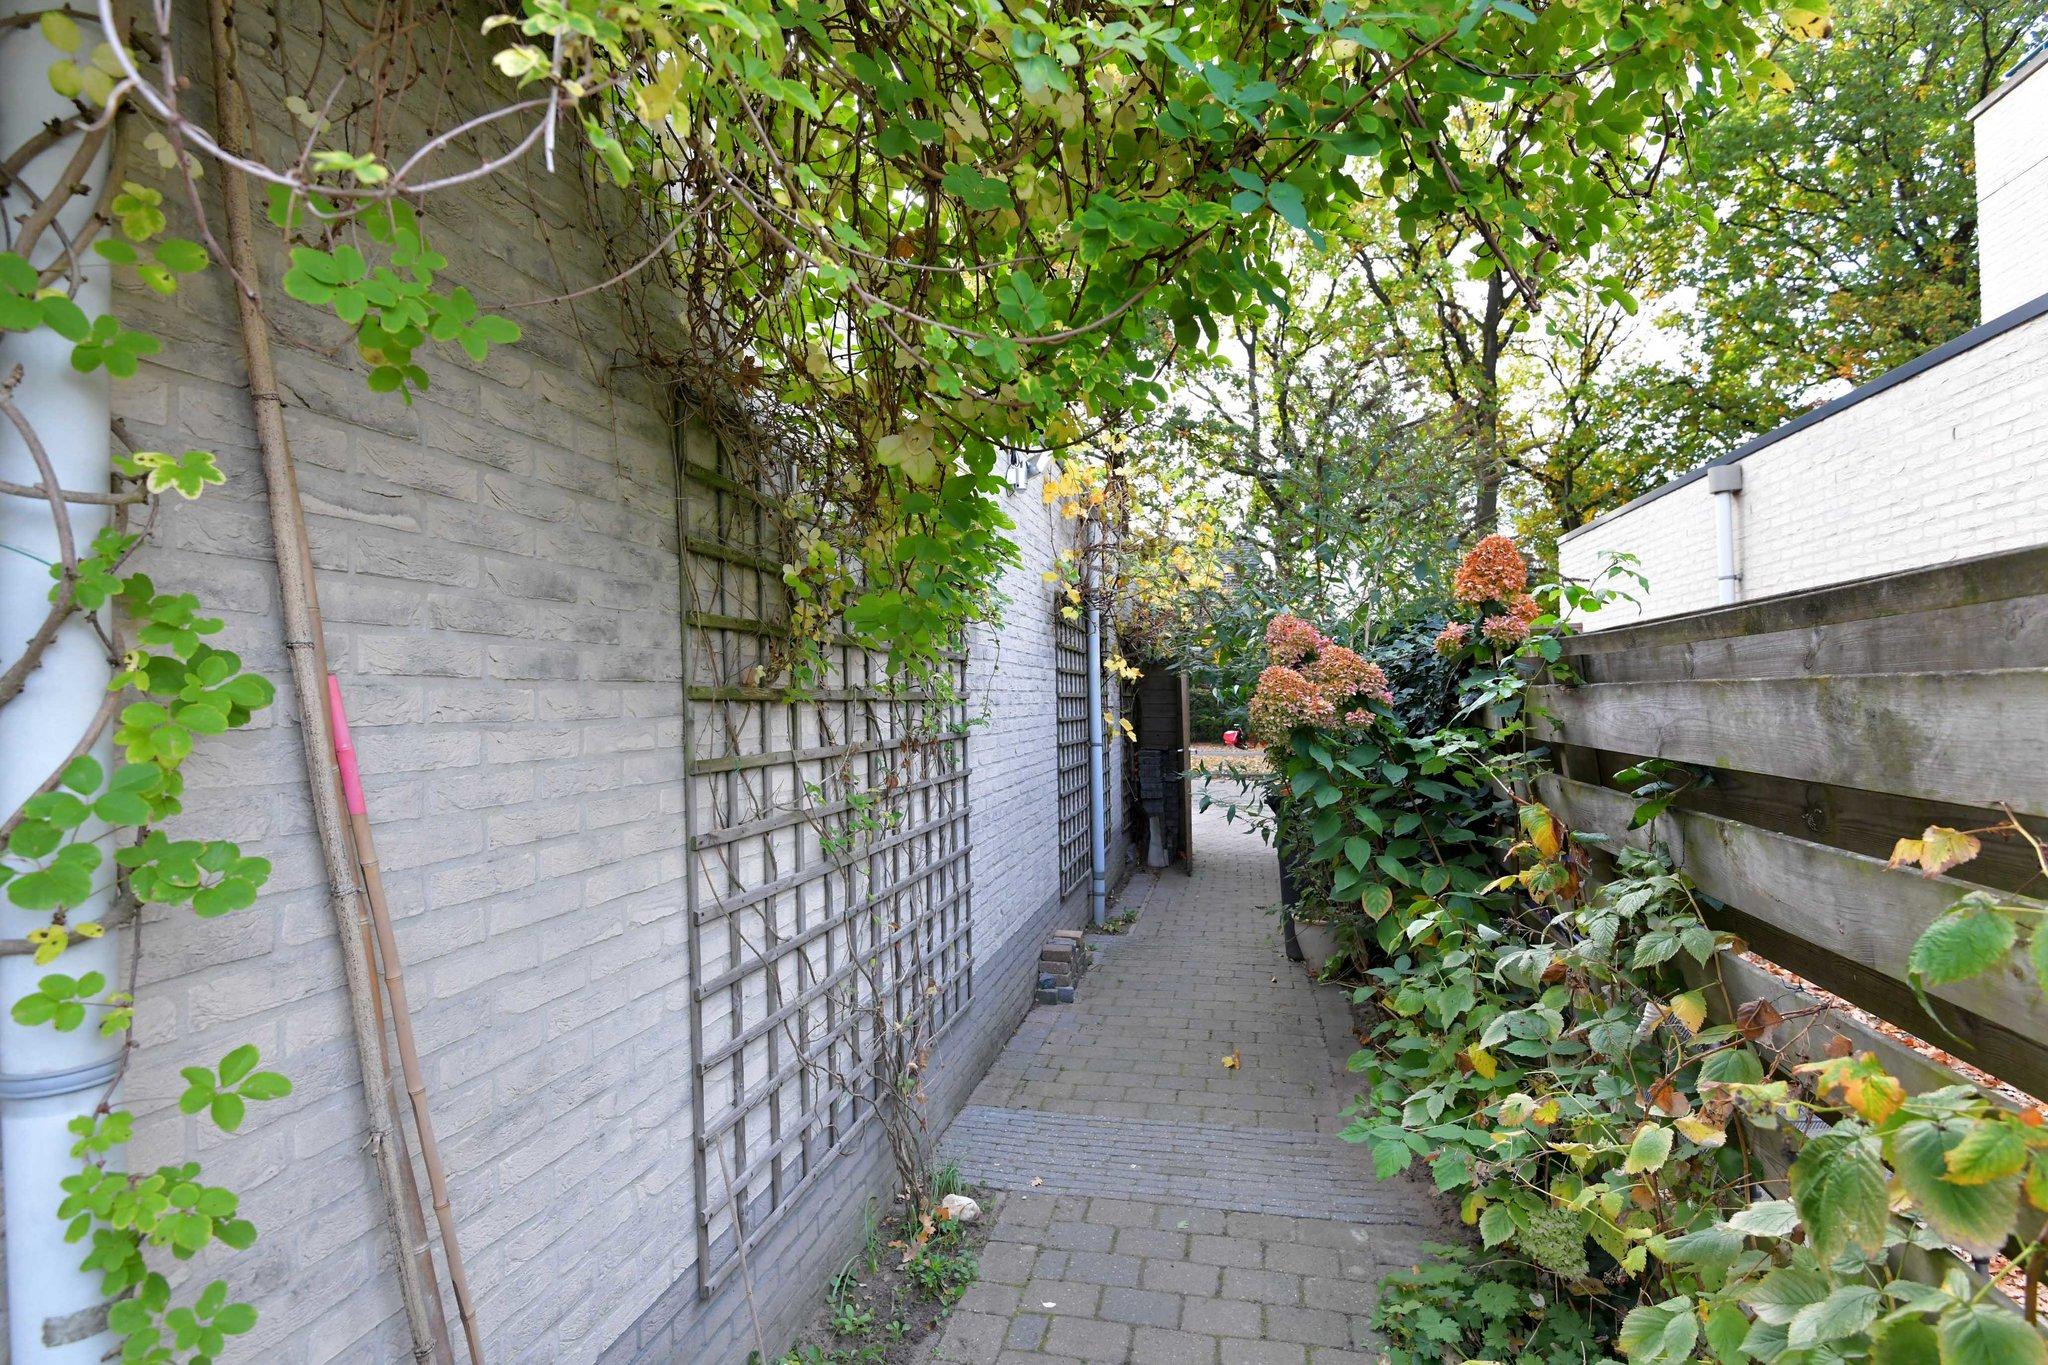 deventer-willem-landrestraat-4226710-foto-36.jpg